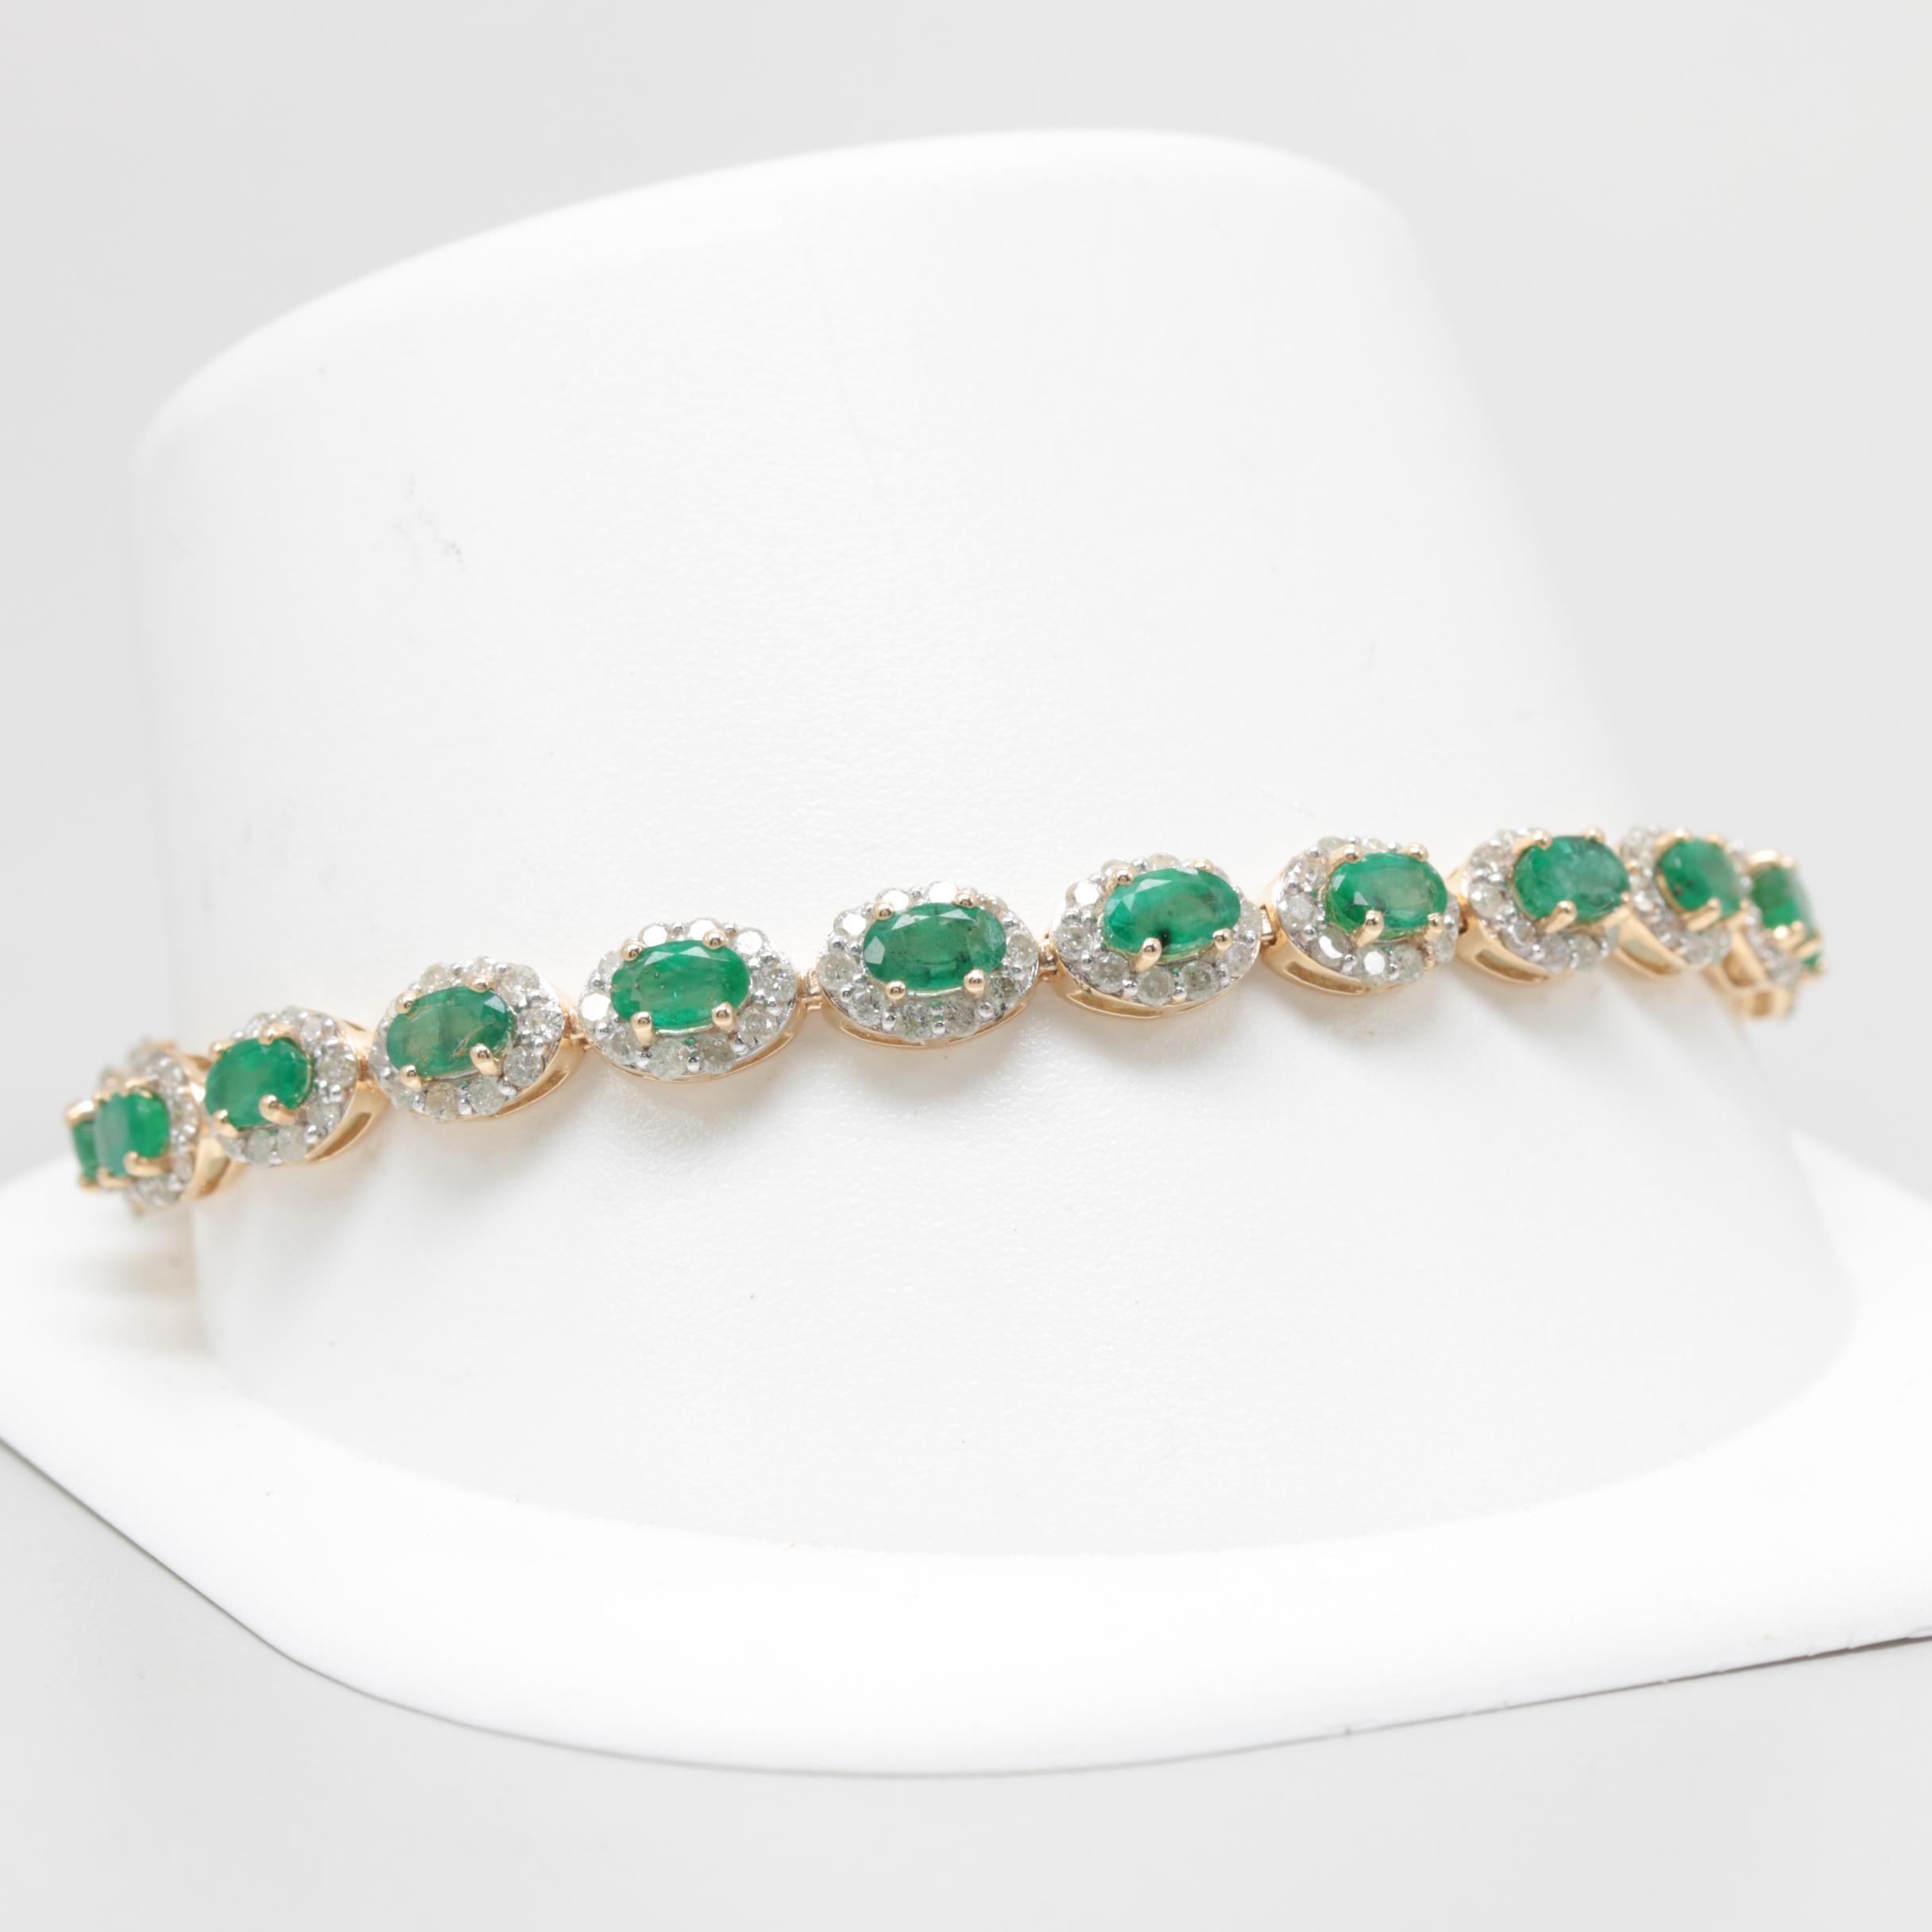 14K Yellow Gold Emerald and 3.30 CTW Diamond Tennis Bracelet